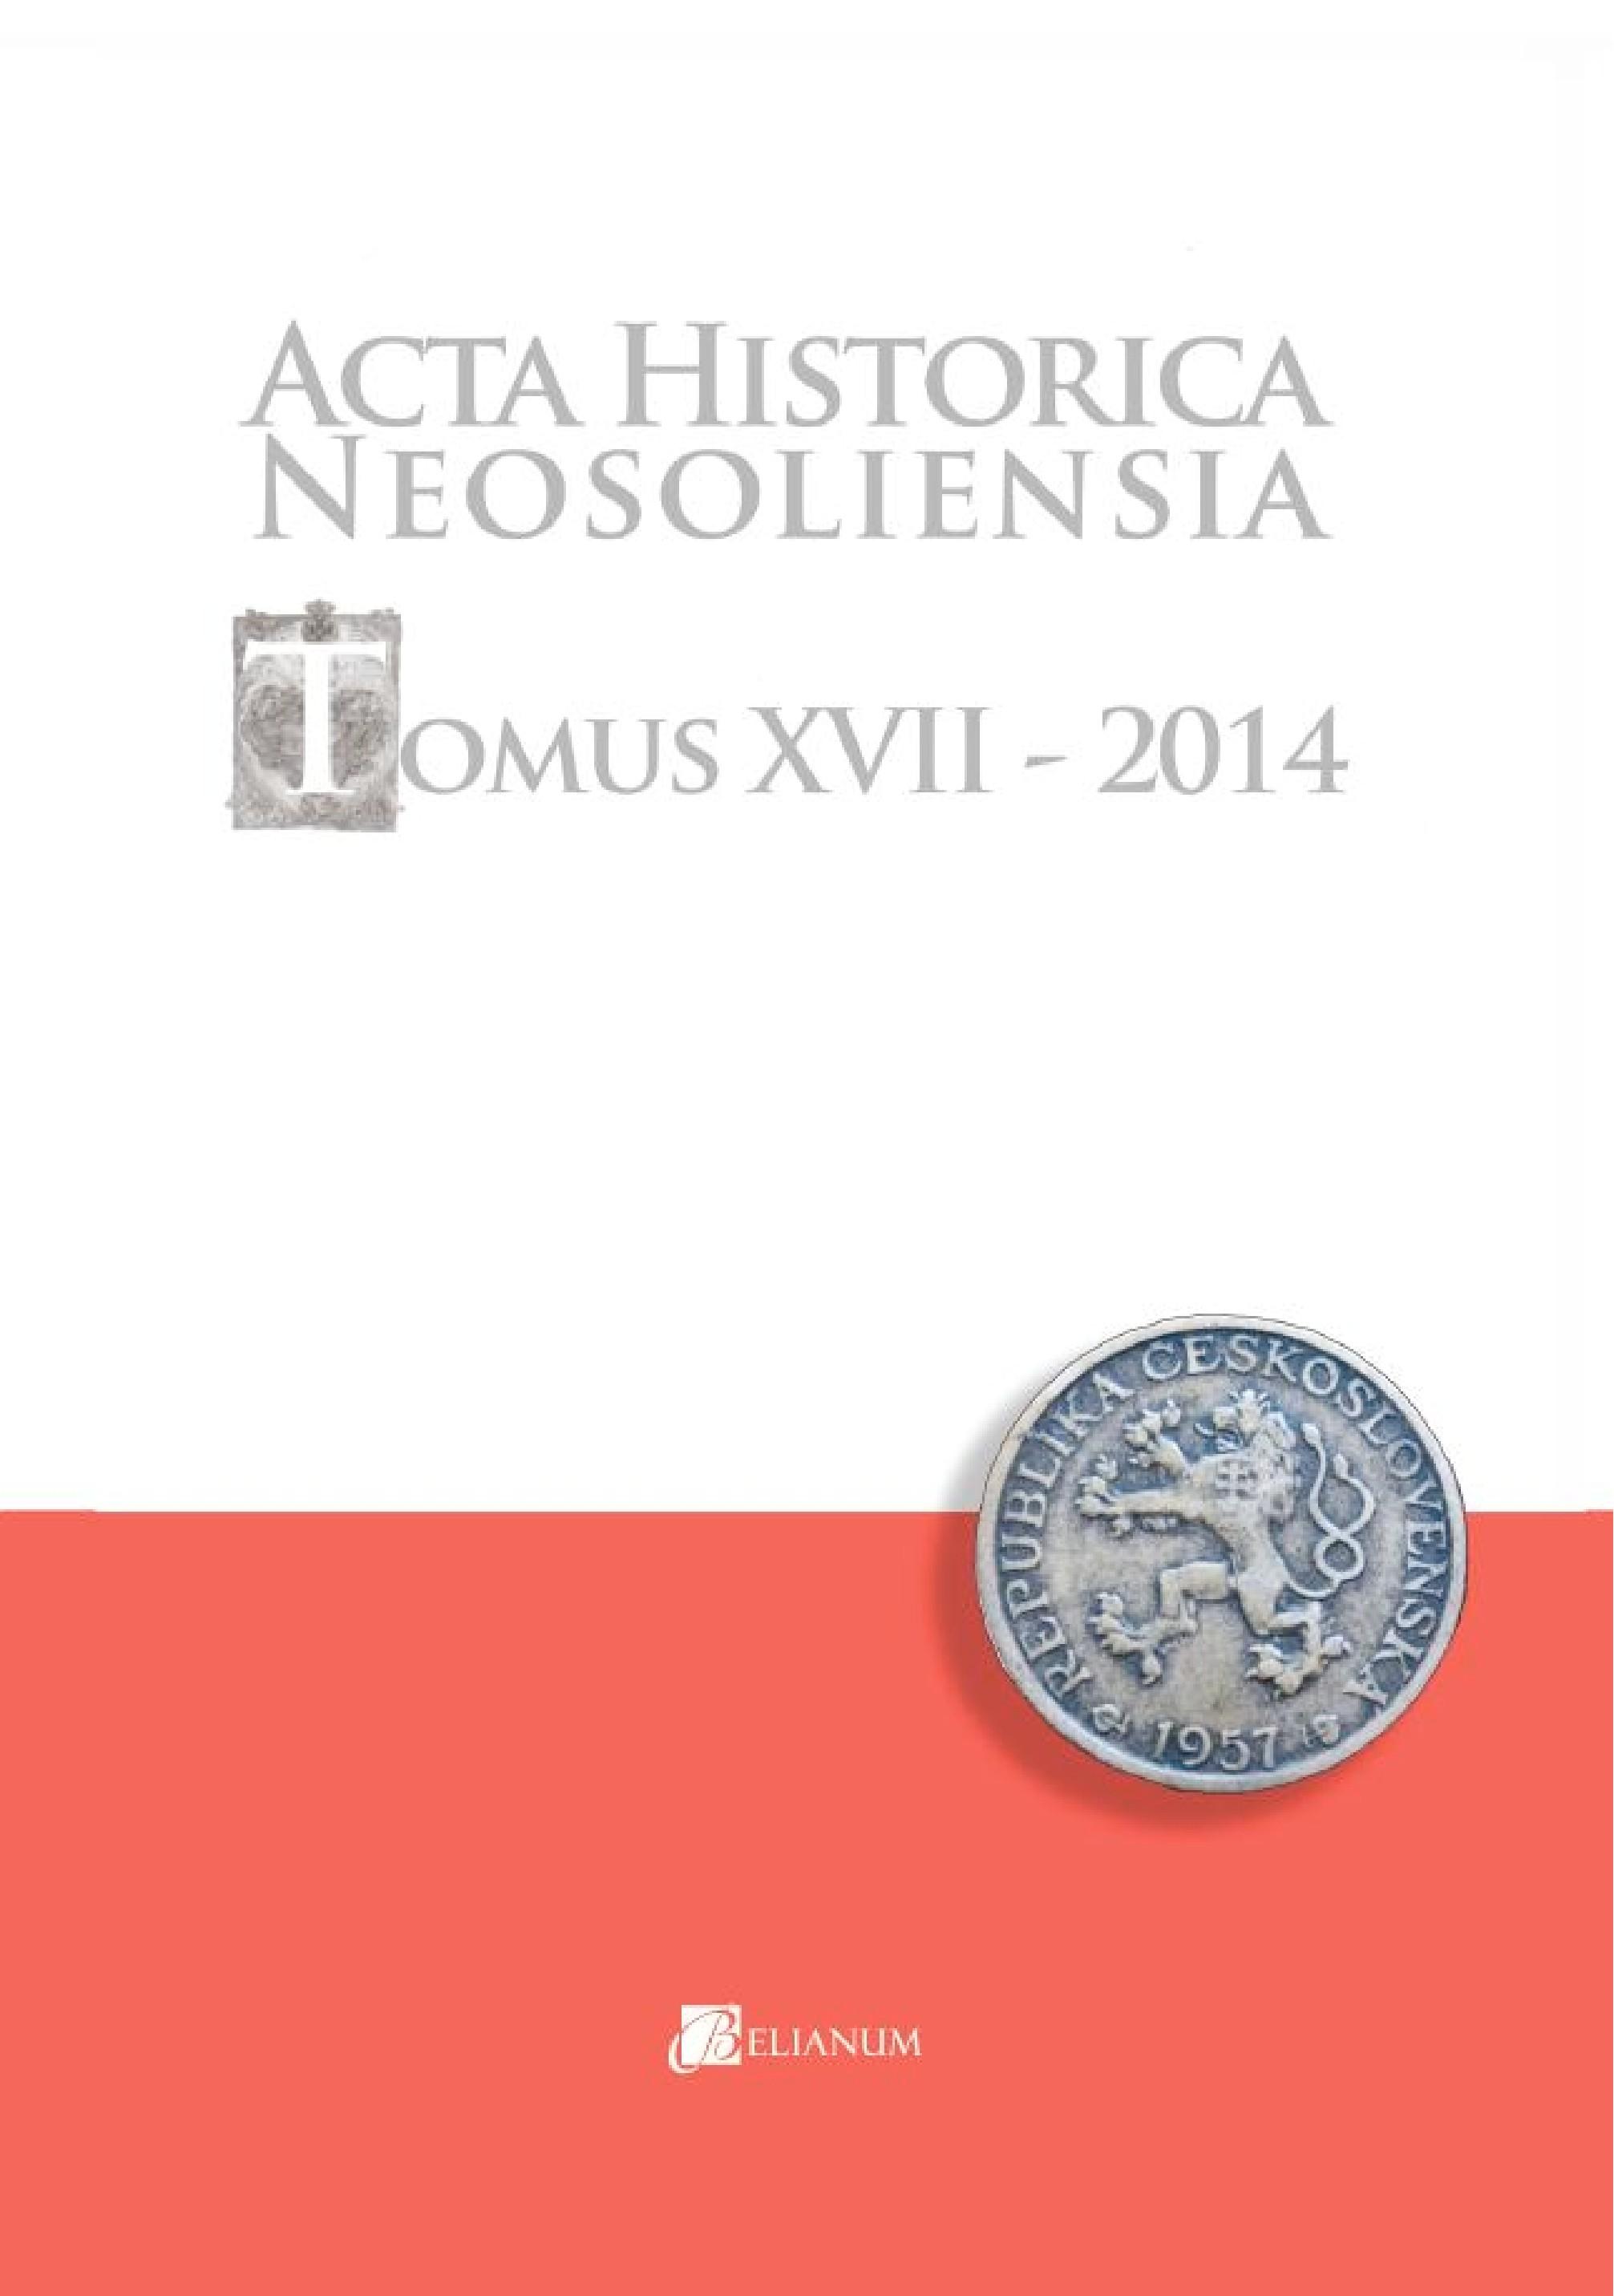 Acta historica neosoliensia, Tomus XVII, 2014, Vol. 1 - 2